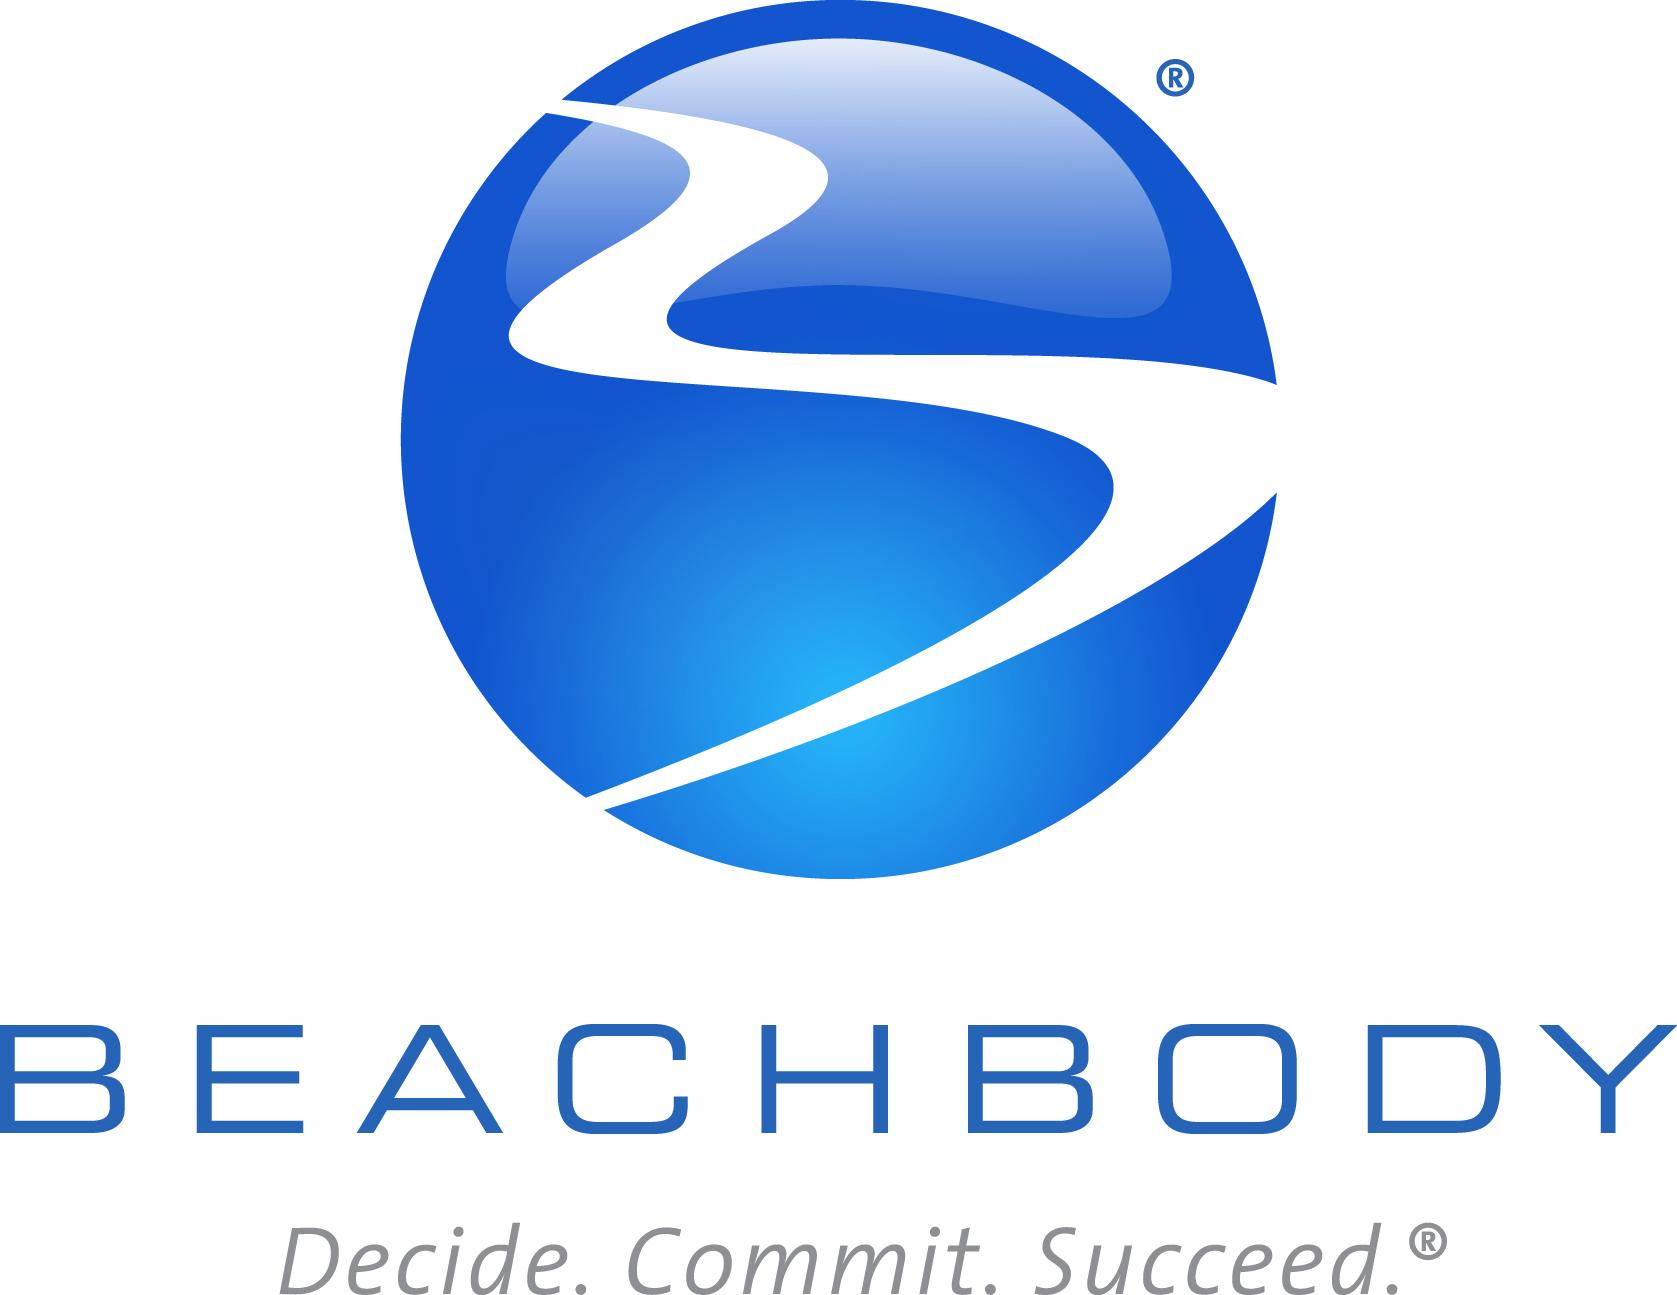 Beachbody Logos.